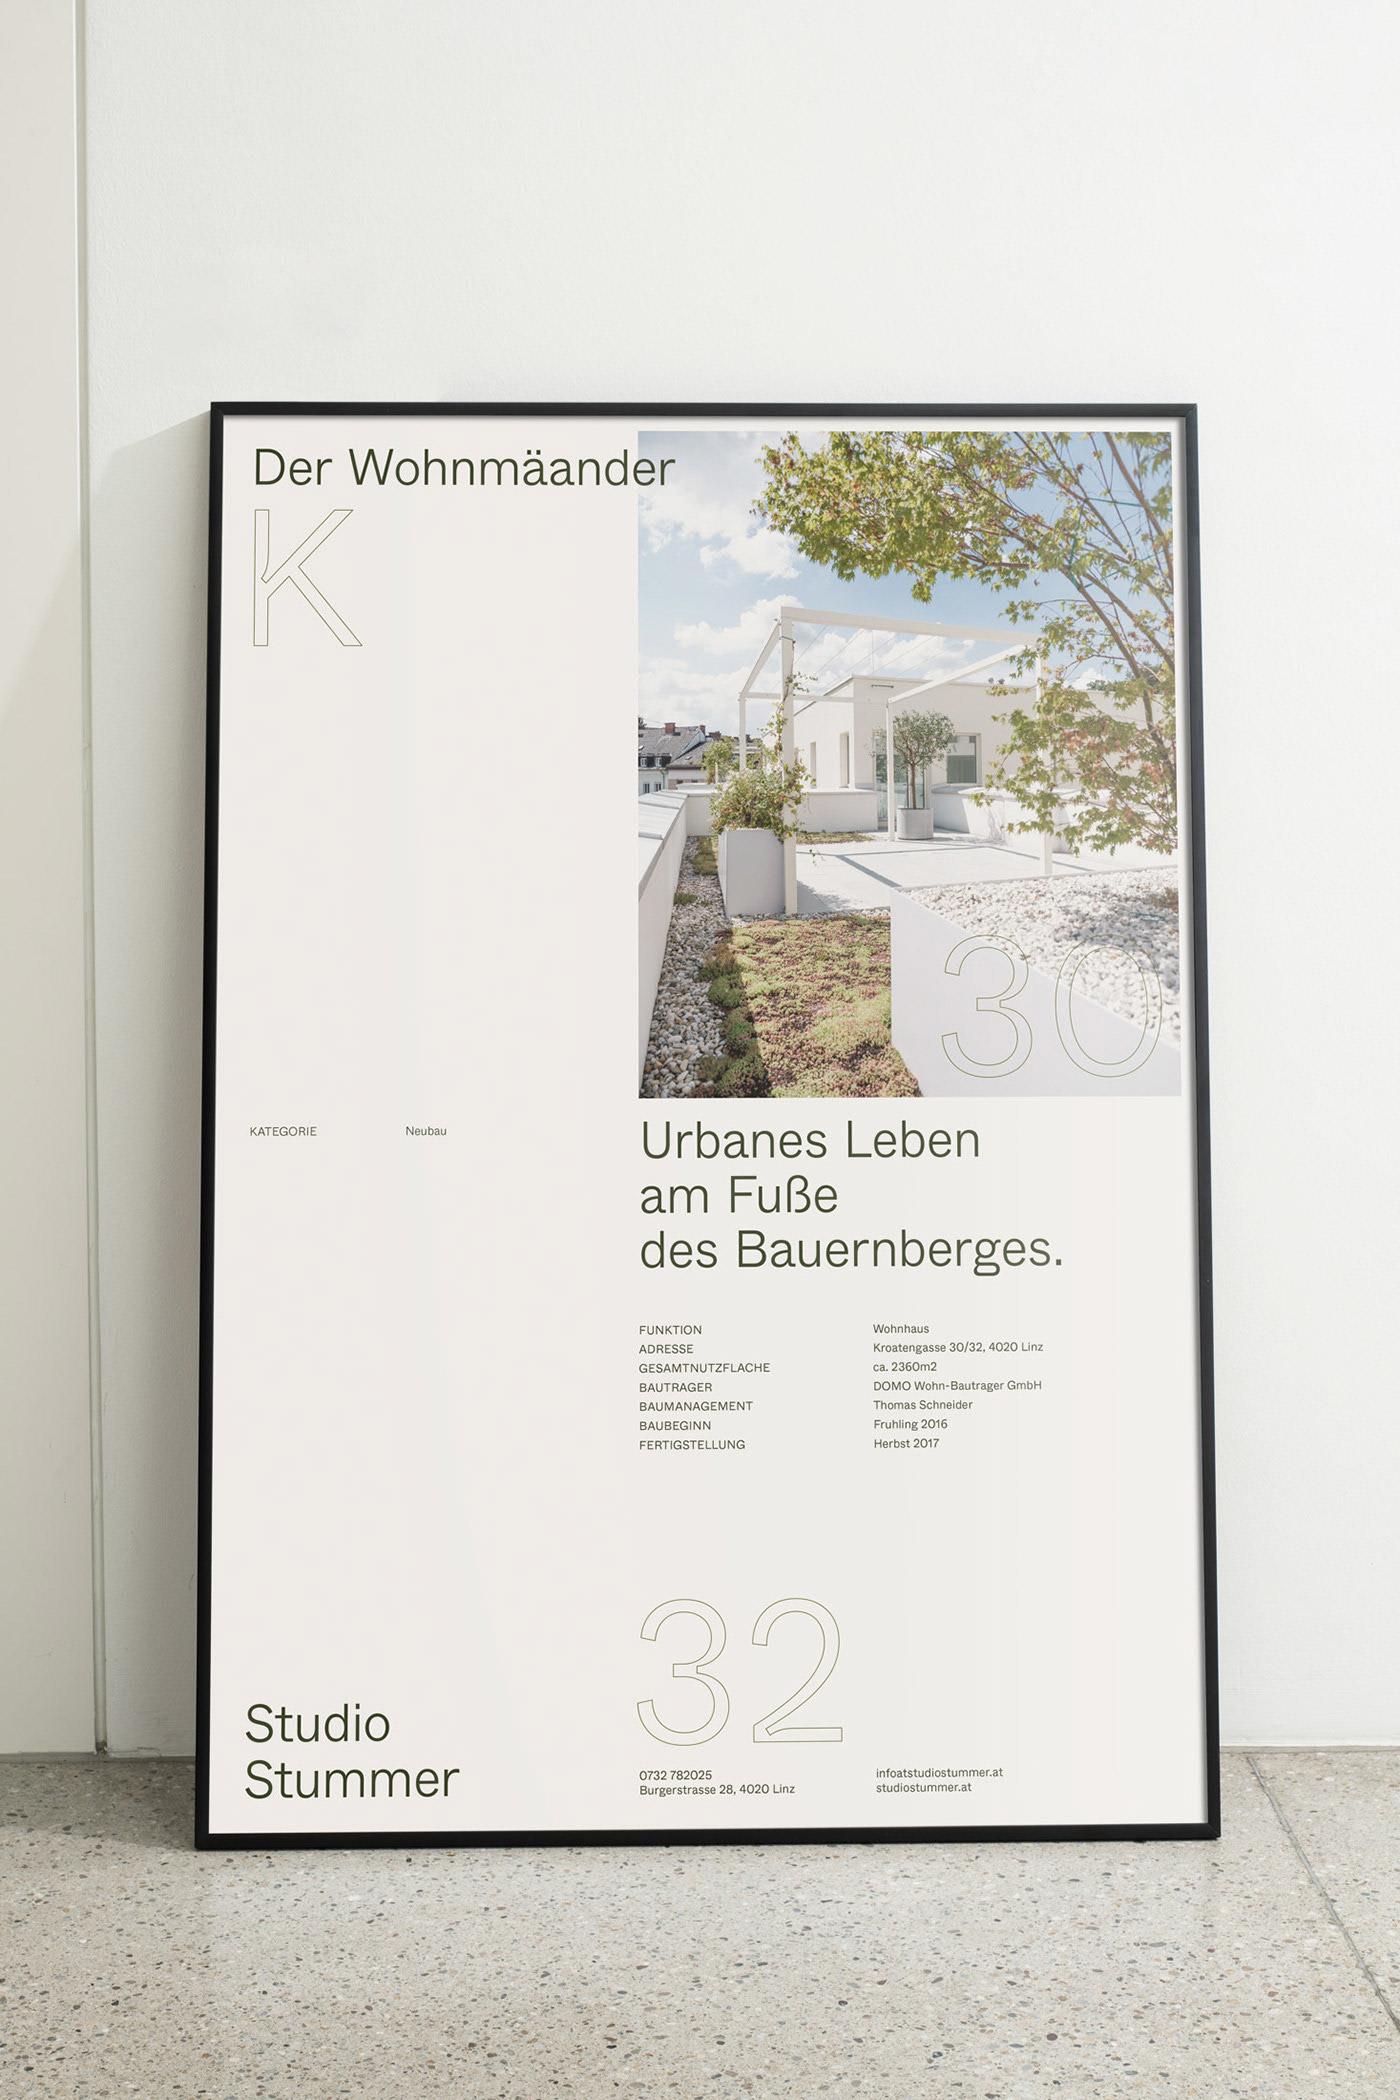 Studio Stummer branding by agency Gletscher.